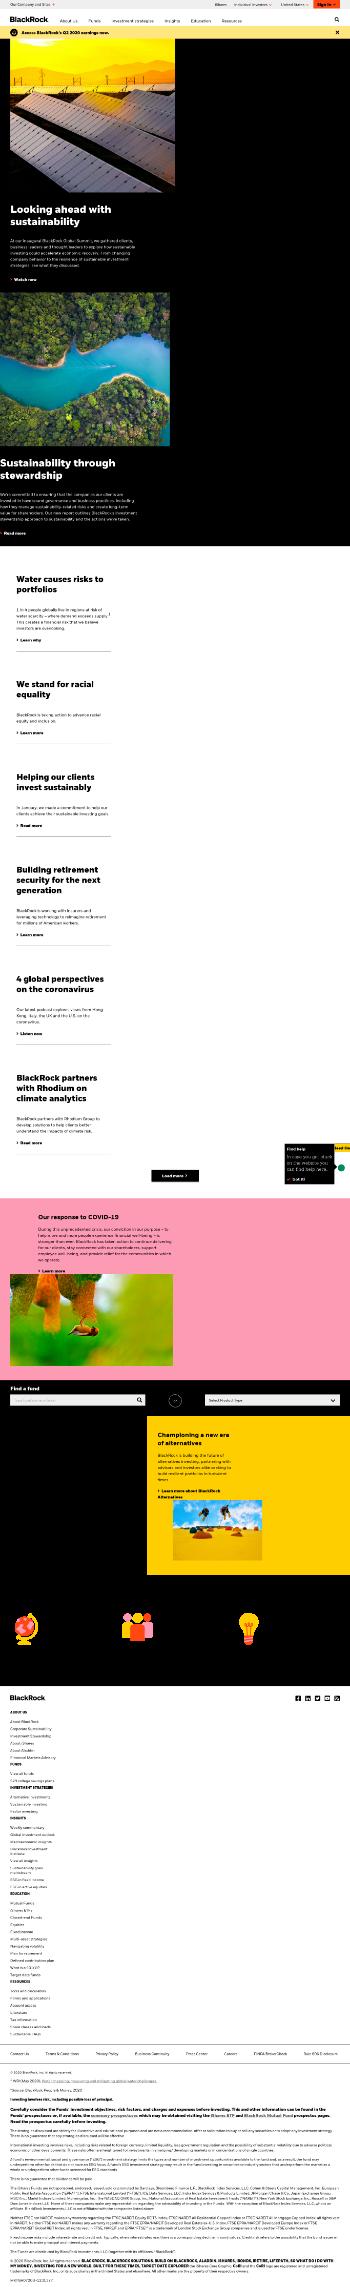 BlackRock MuniYield Quality Fund III, Inc. Website Screenshot